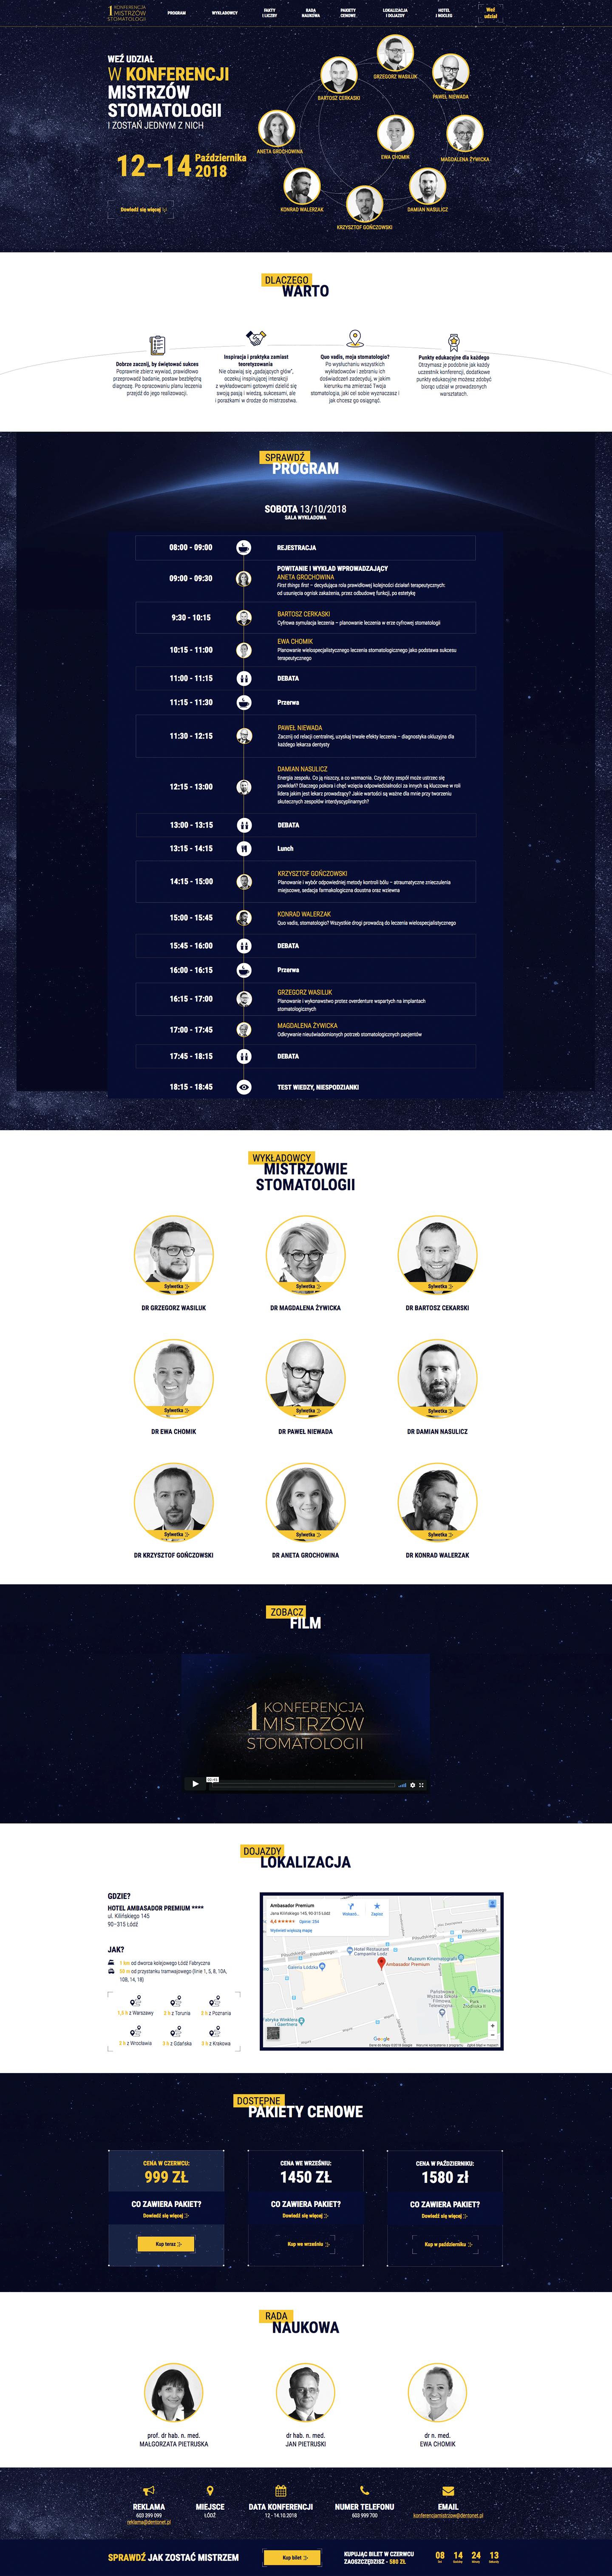 Dentonet Conference Landing Page